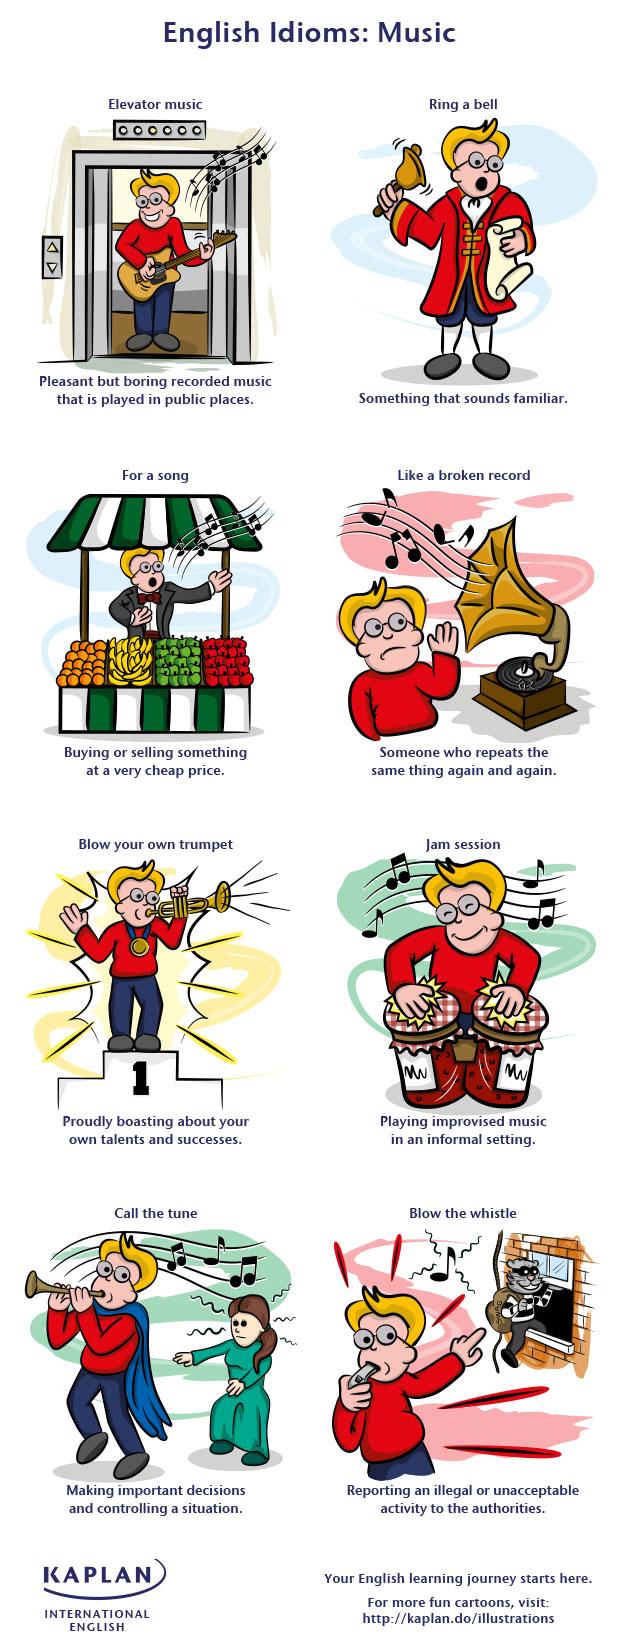 music idioms in english